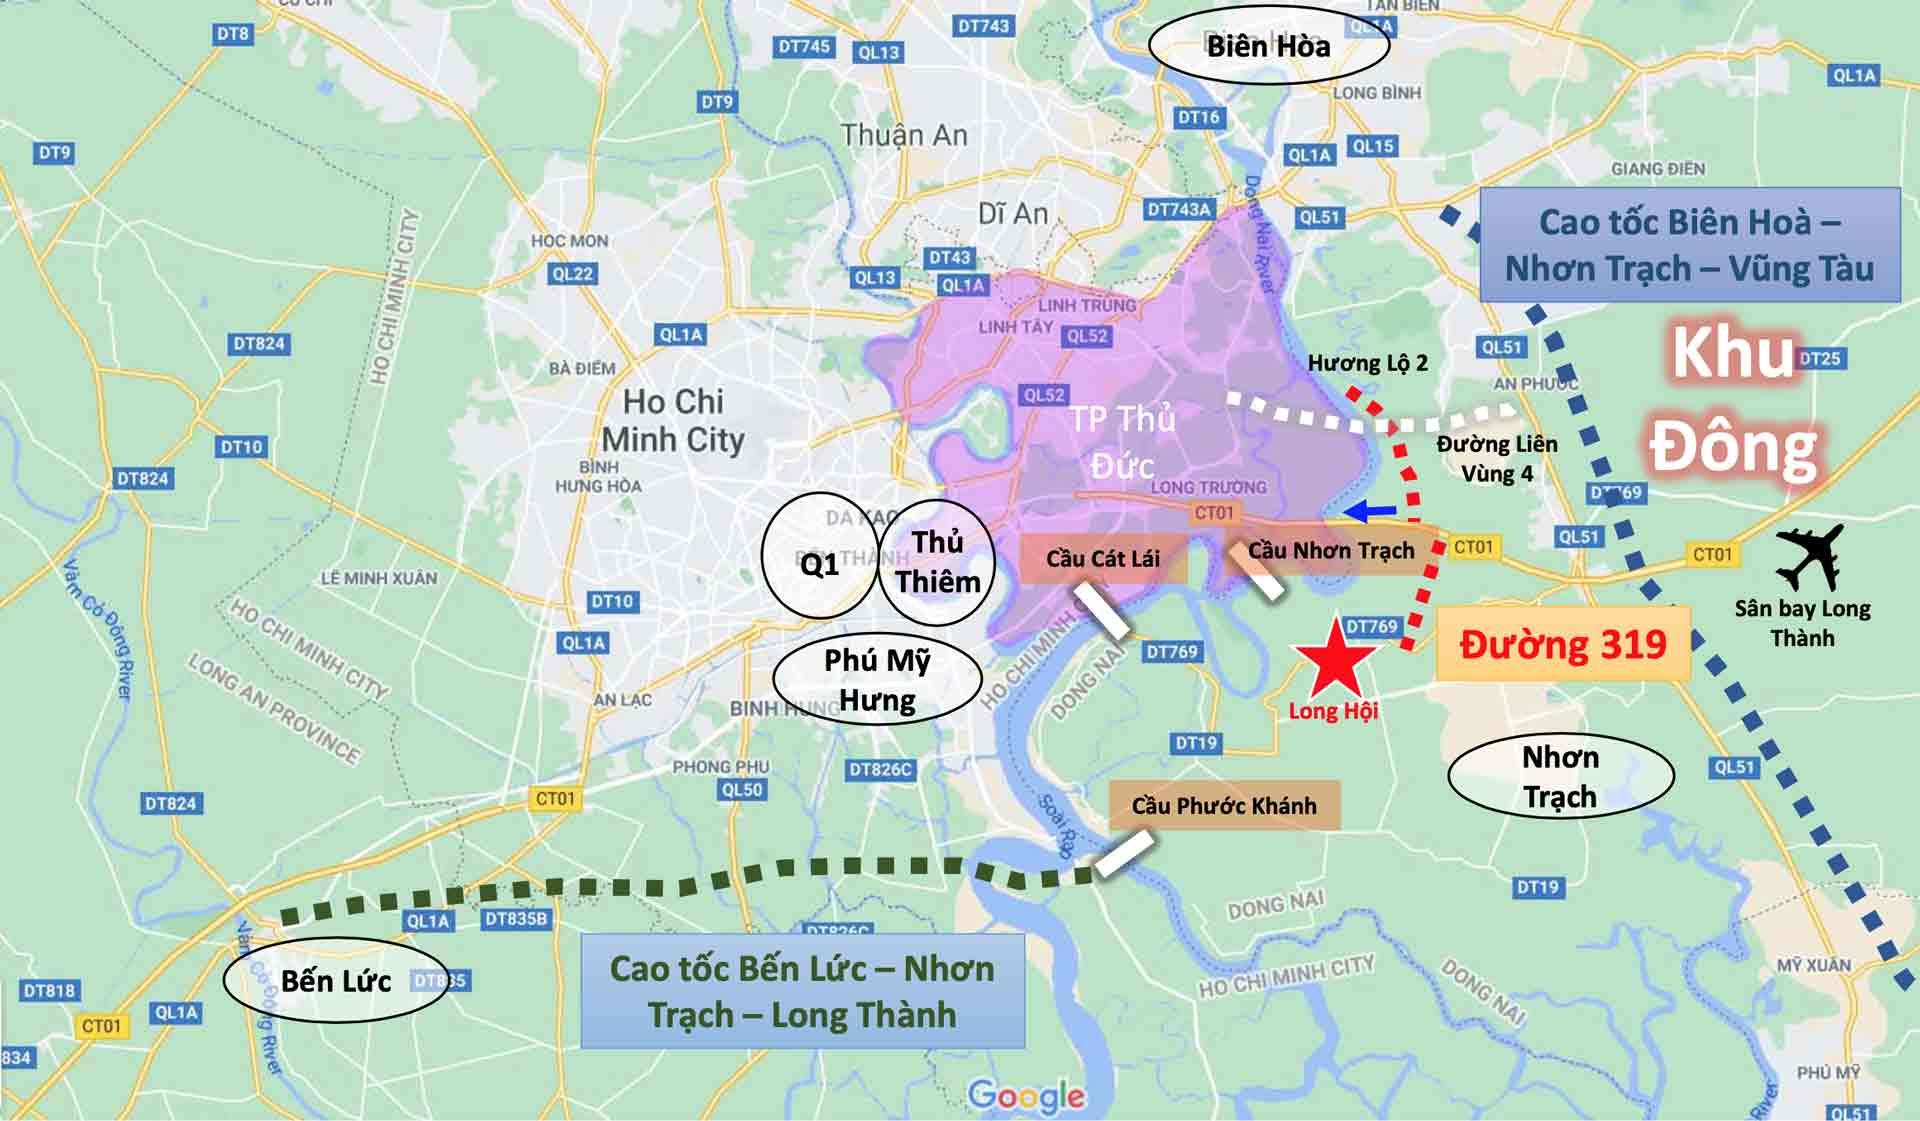 Ha-tang-ket-noi-long-hoi-central-point